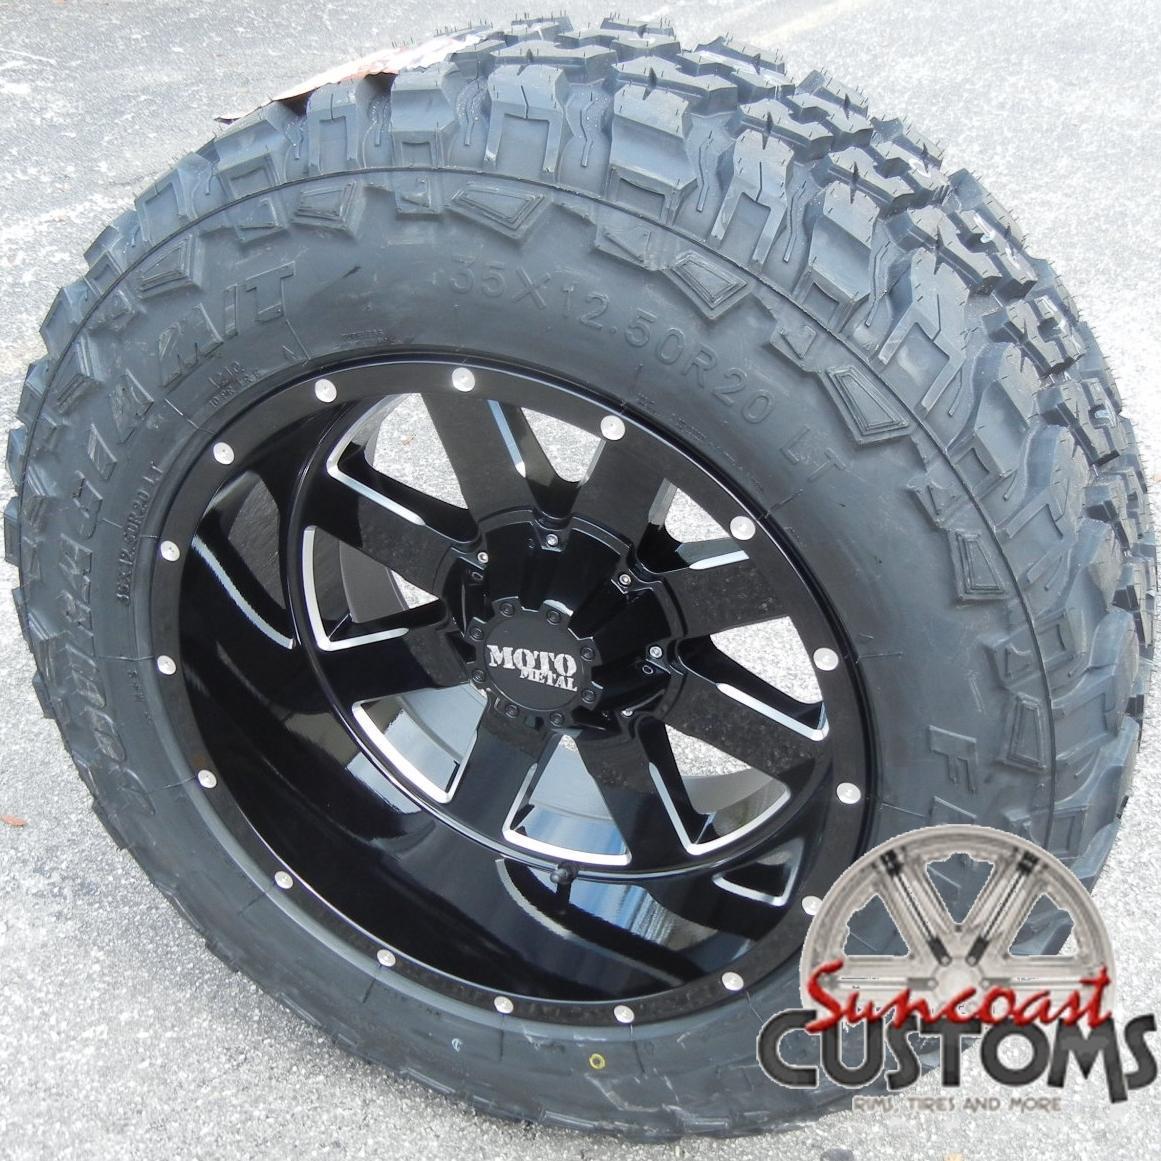 moto metal 962. 20x12 8x180 moto metal 962 rims \u0026 federal mt tires (custom tire and wheel packages) moto metal